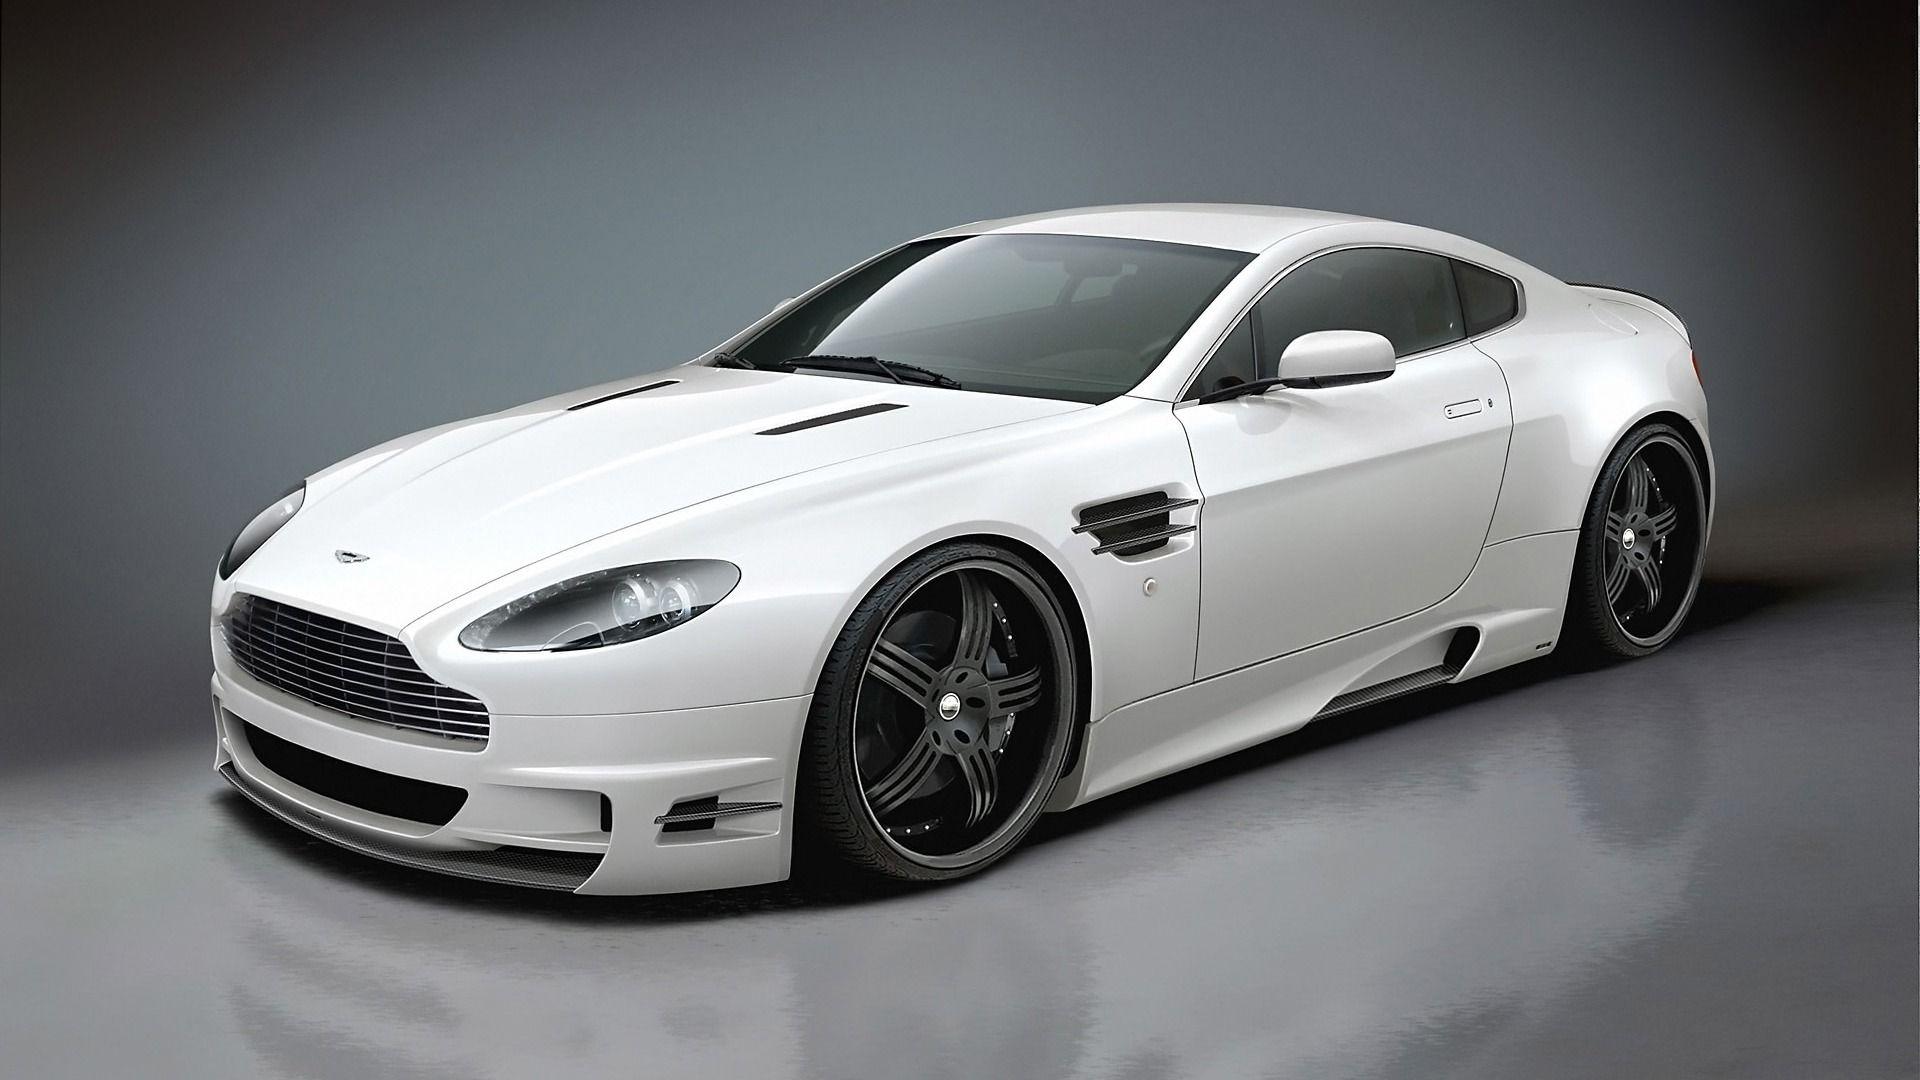 awesome cars Aston Martin vehicles white cars Aston Martin